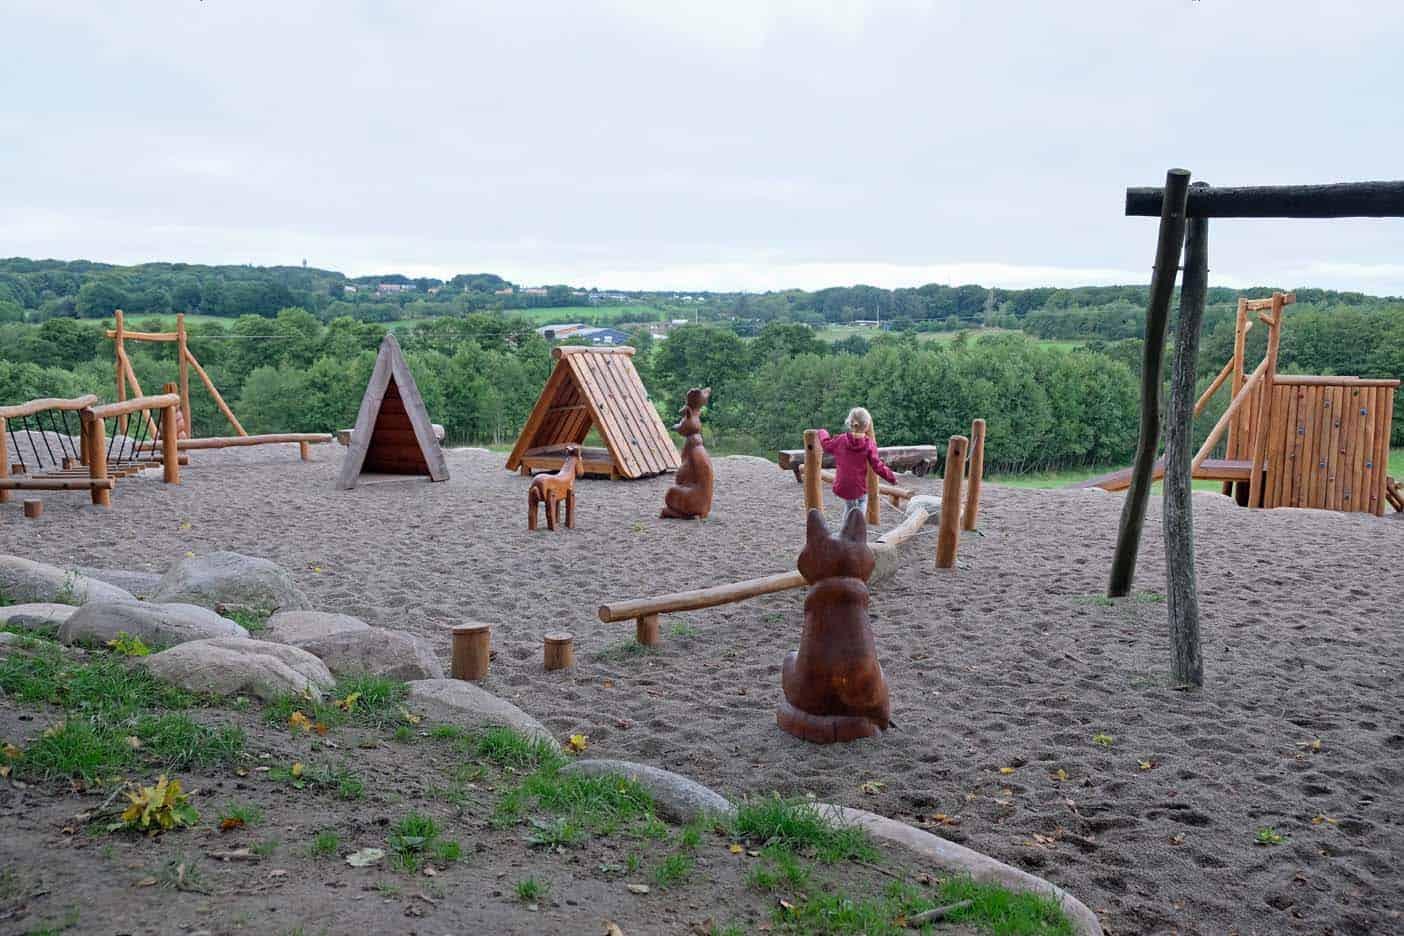 bangsbo speeltuin